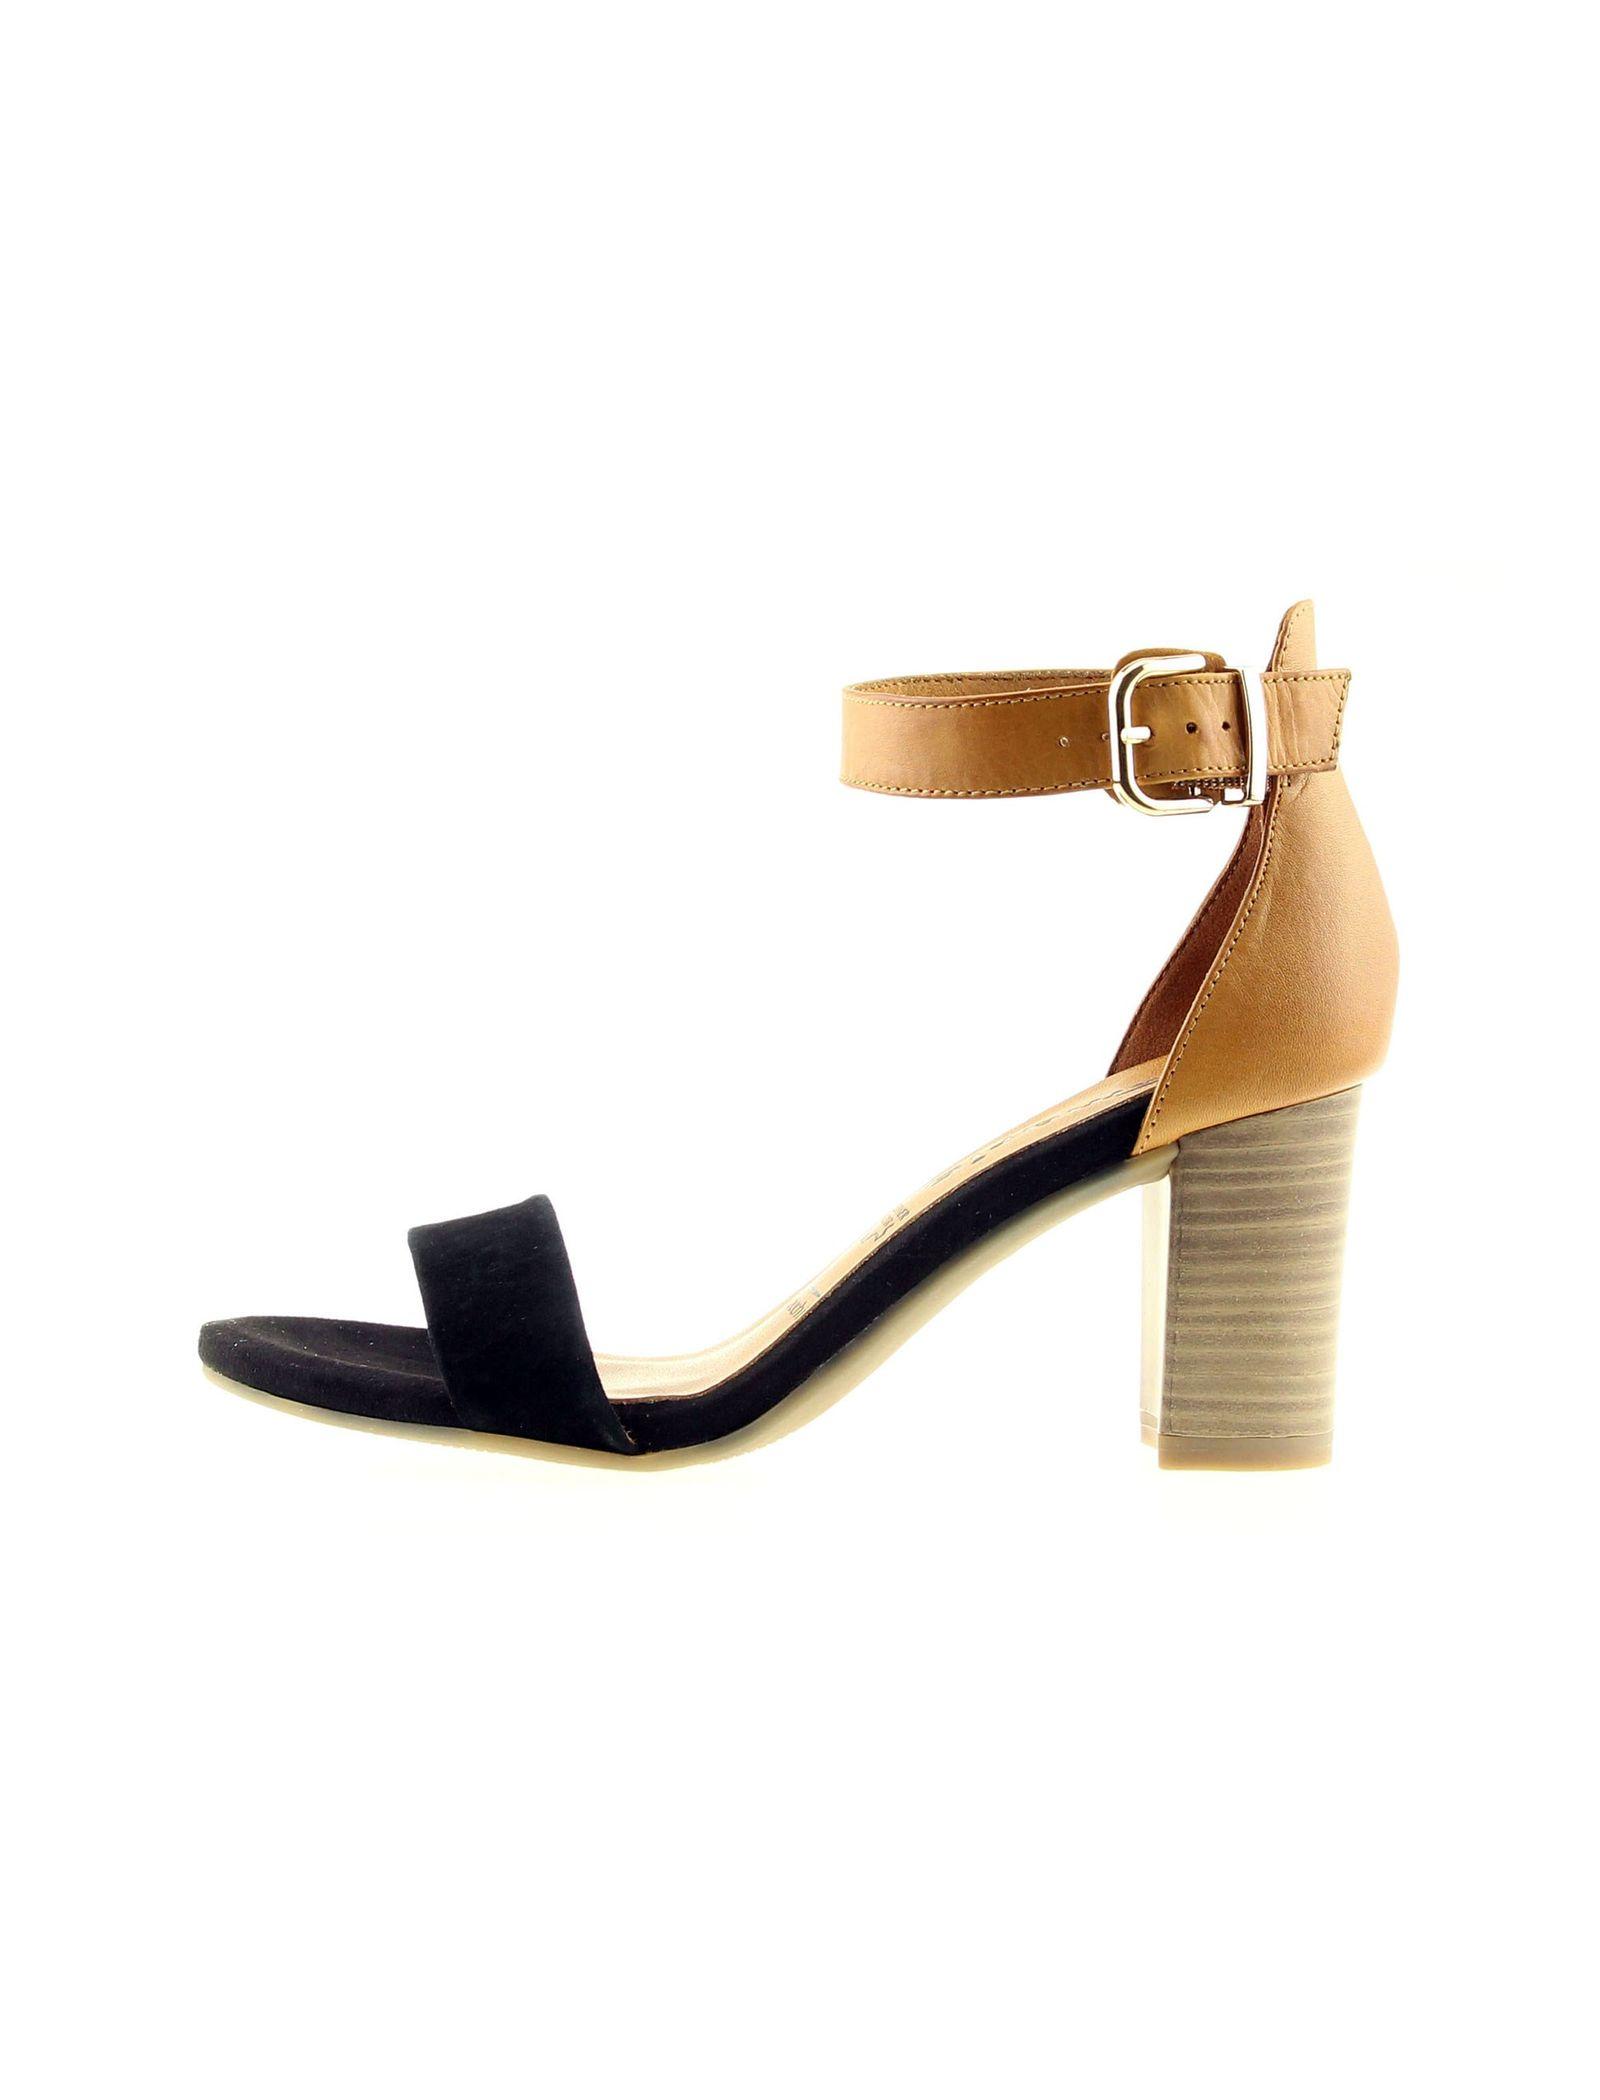 کفش پاشنه بلند چرم زنانه - تاماریس - مشکي و عسلي - 3